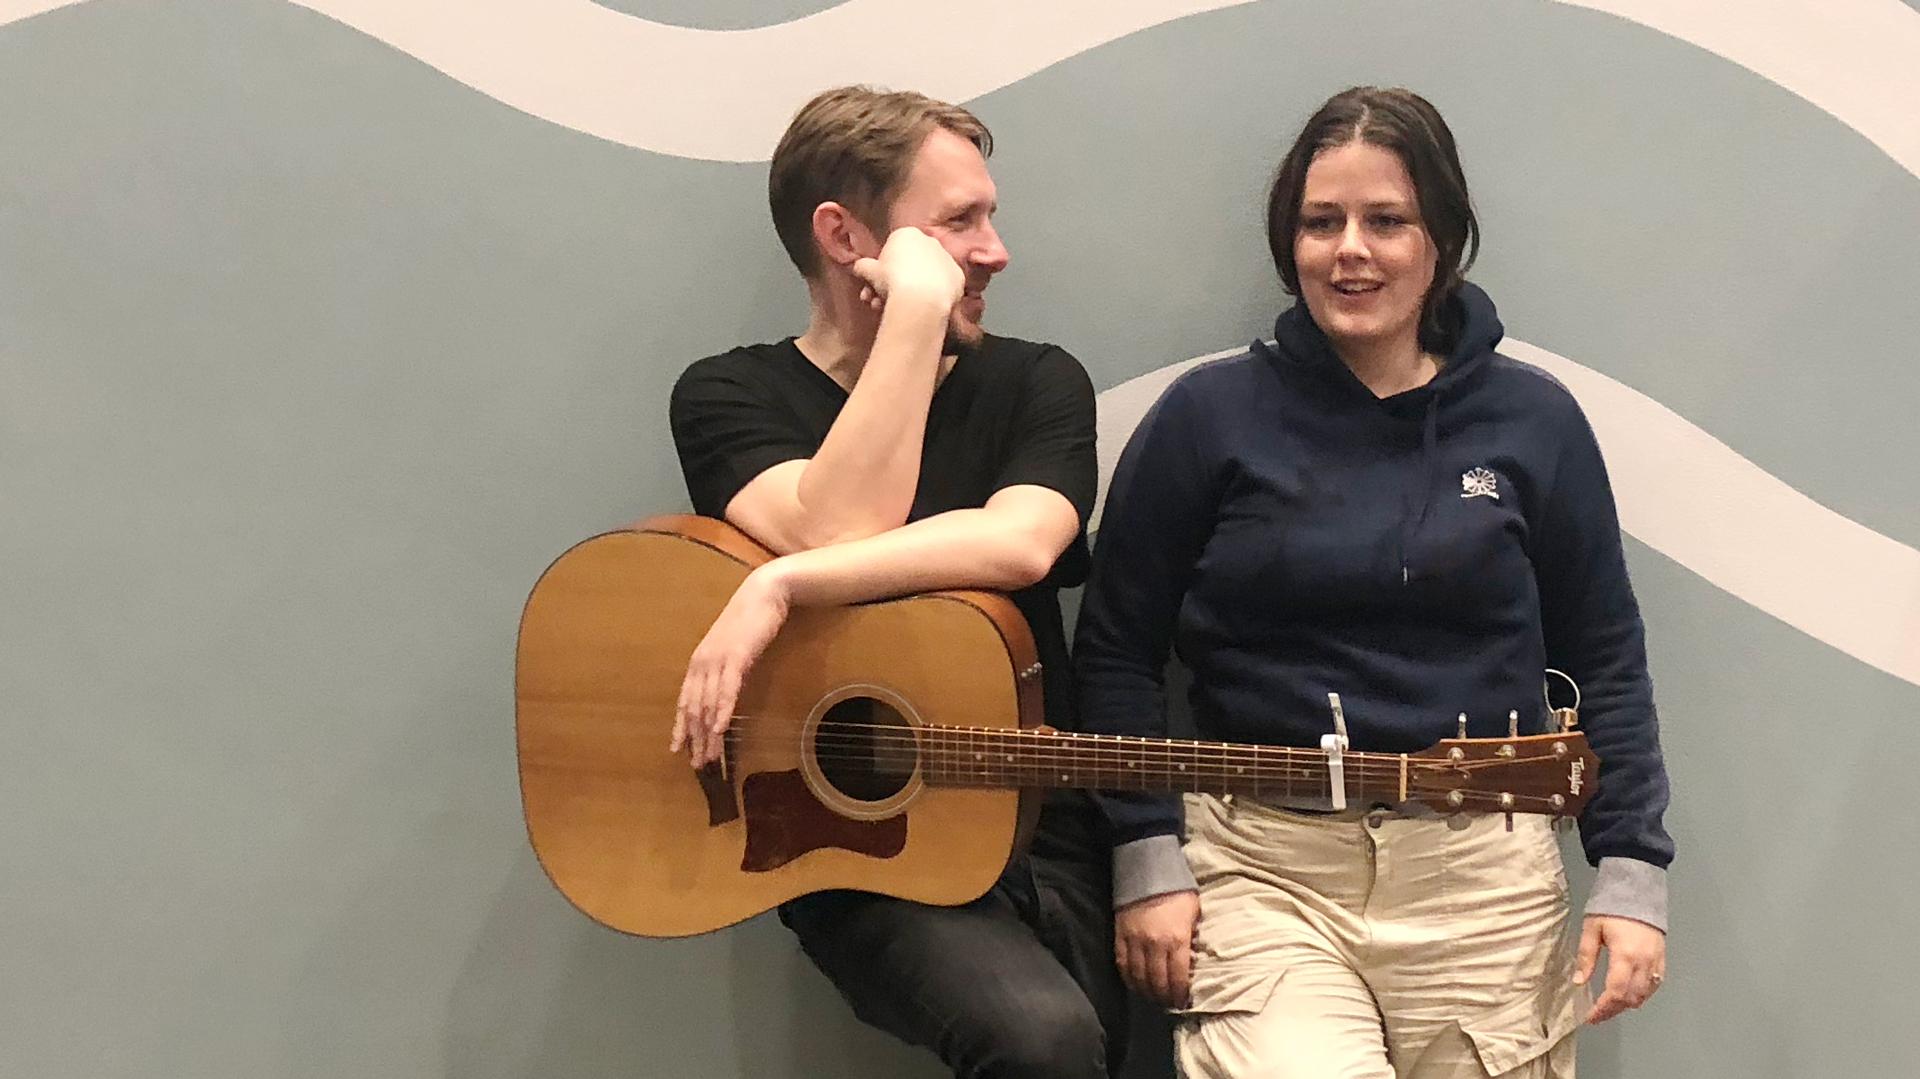 Sangskriver med Jada og Jonas